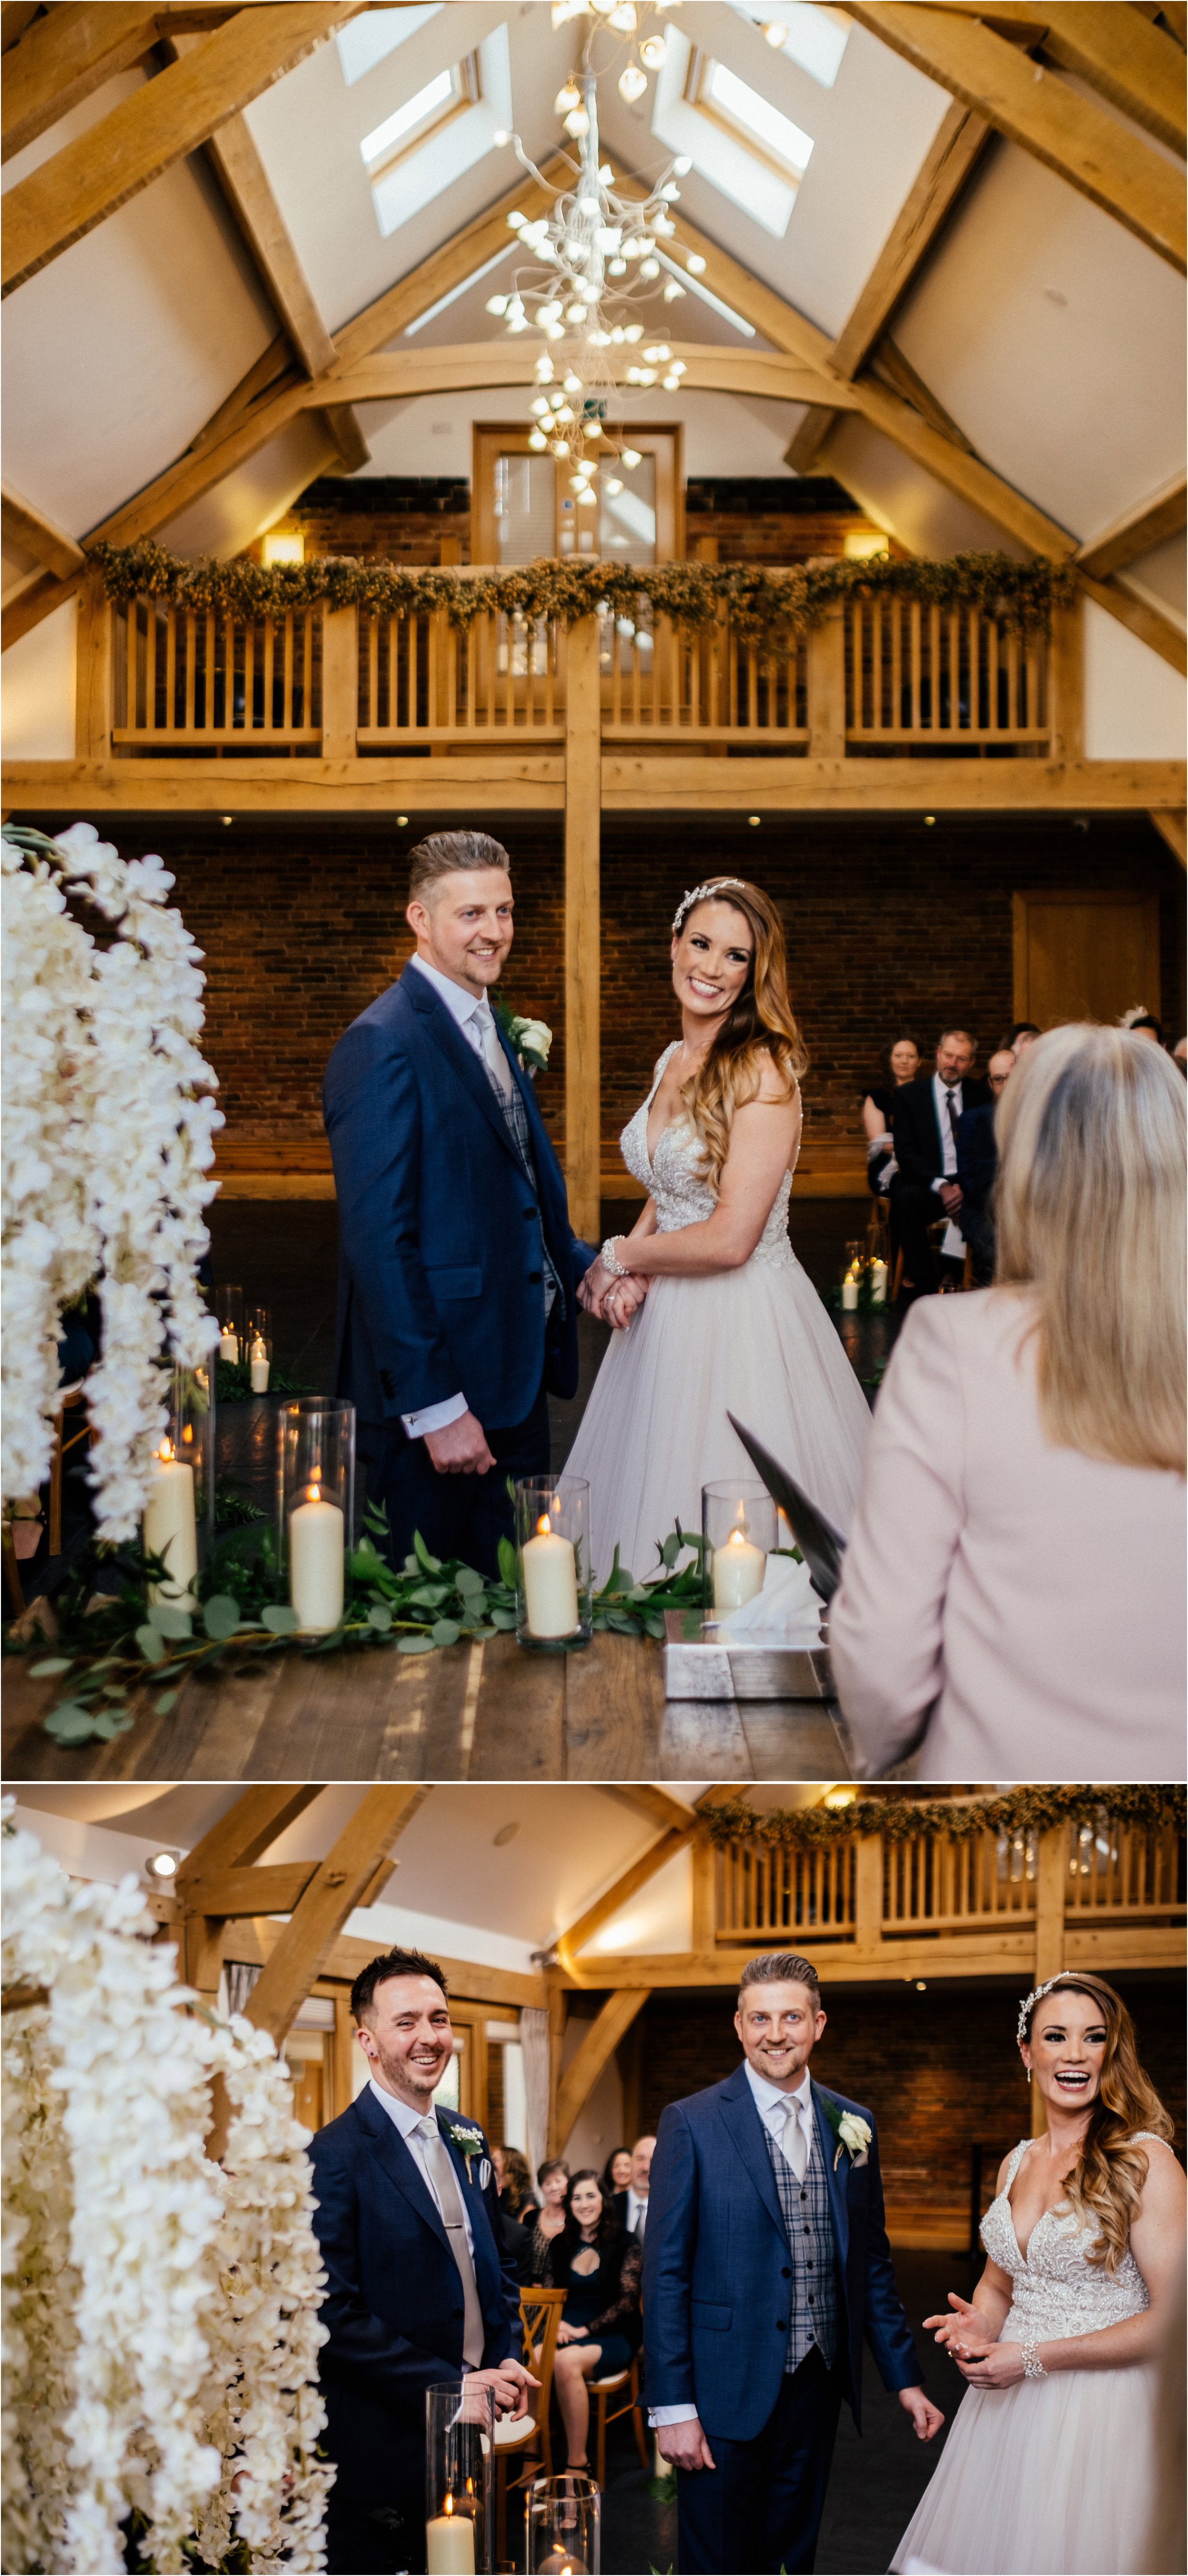 Mythe Barn wedding photographer_0053.jpg